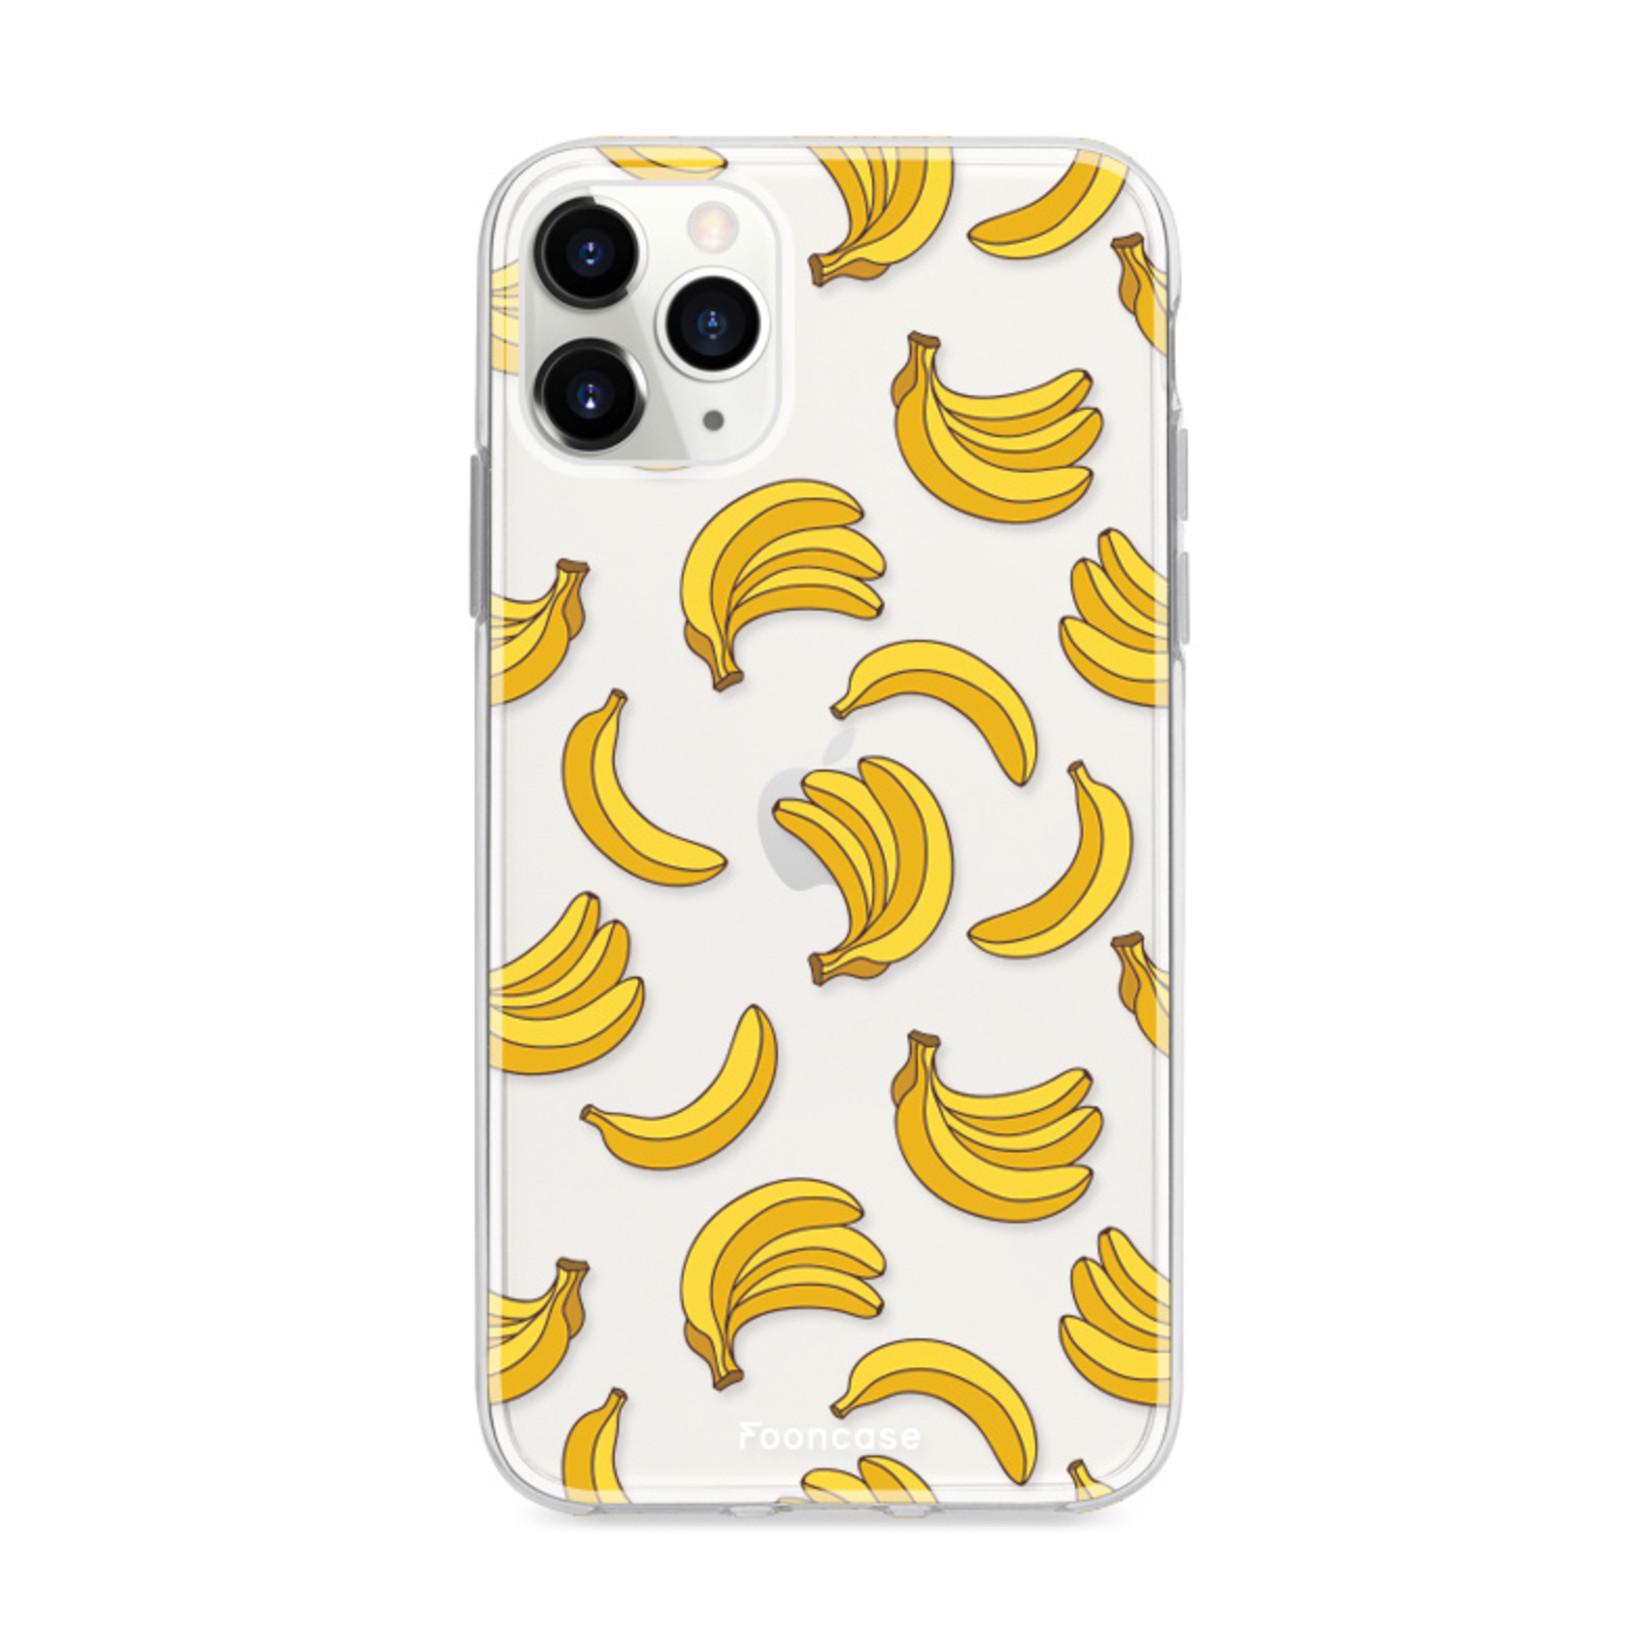 FOONCASE iPhone 12 Pro hoesje TPU Soft Case - Back Cover - Bananas / Banaan / Bananen